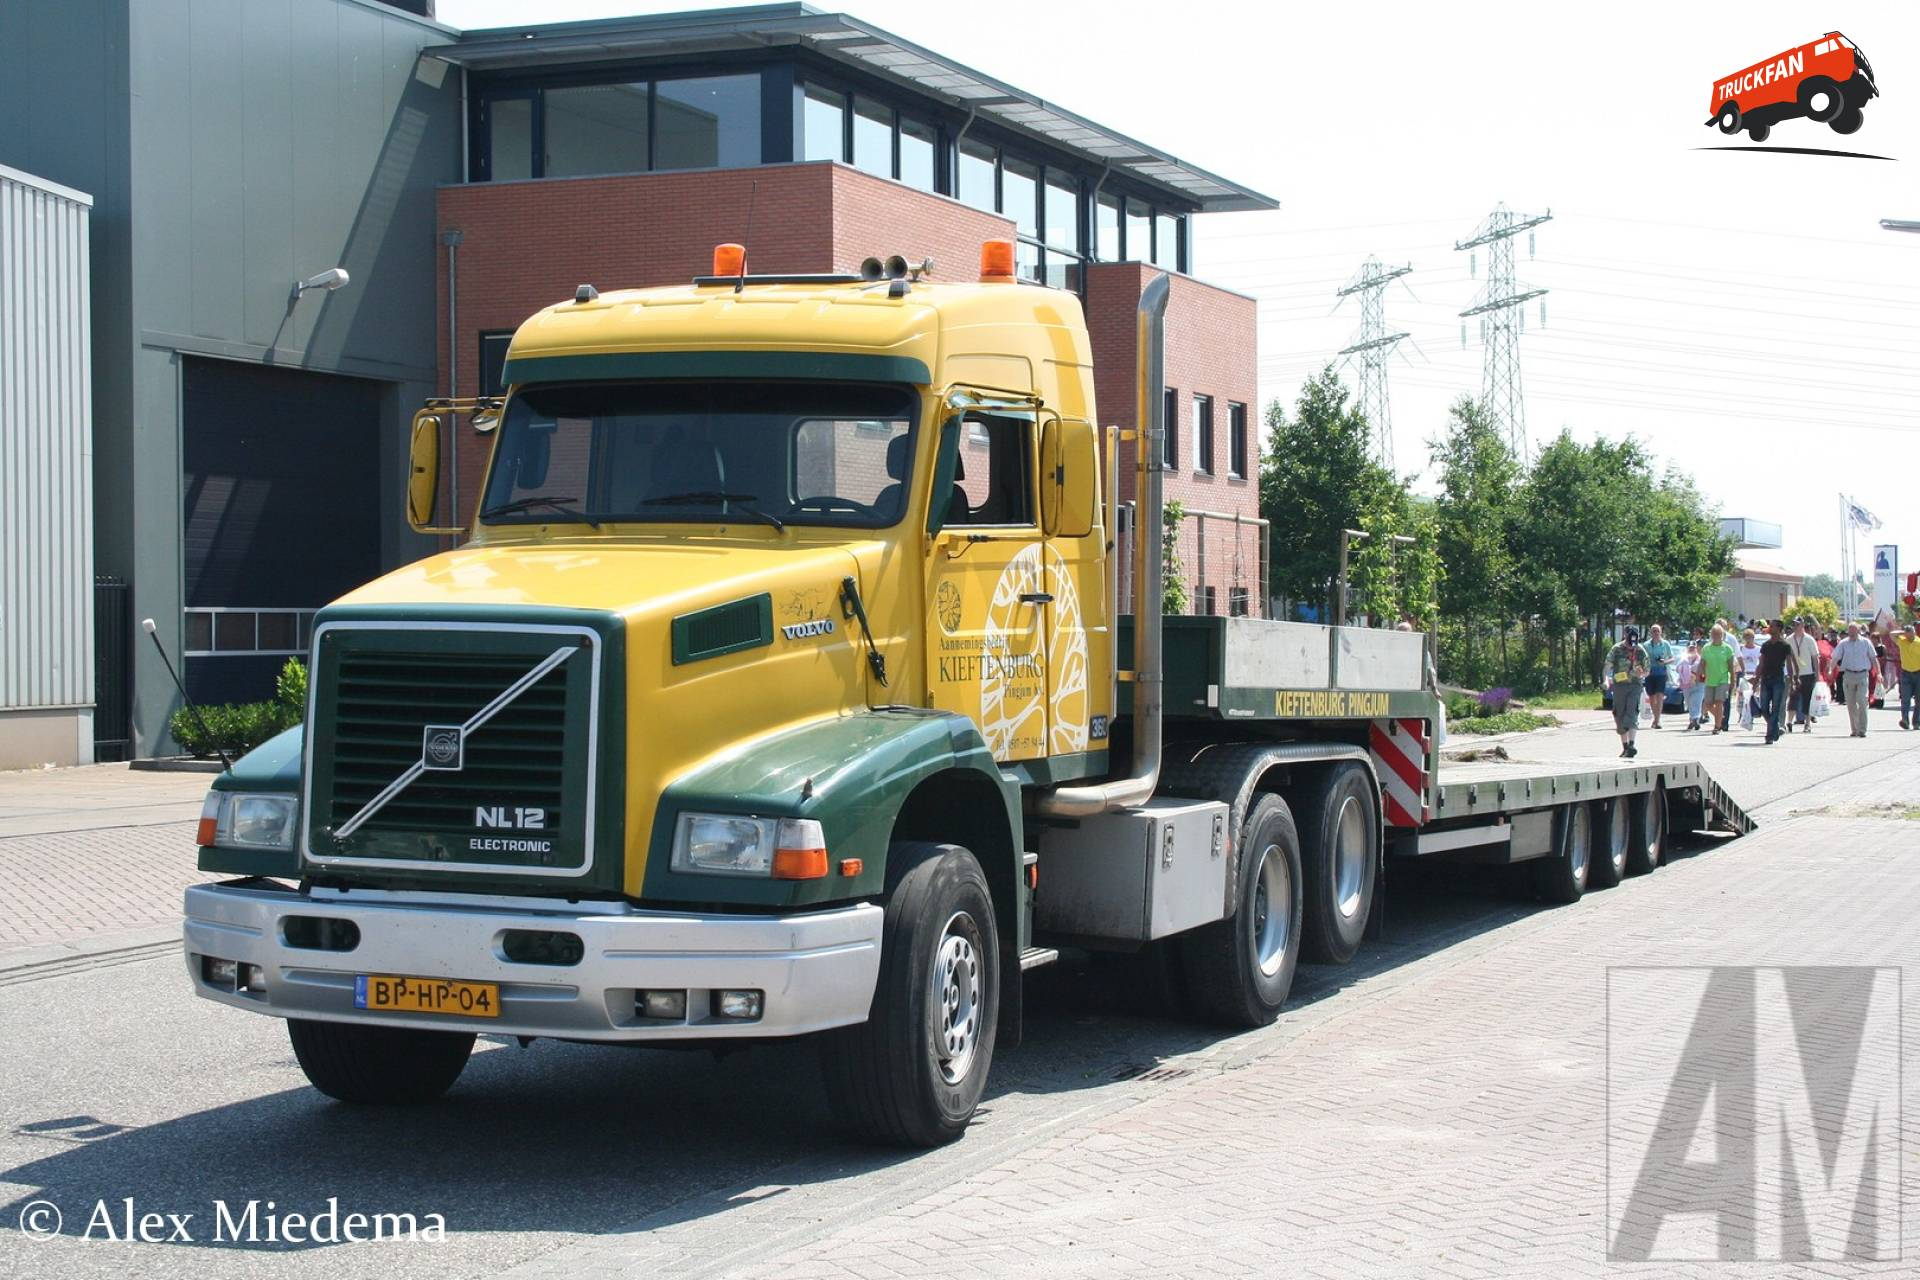 Volvo NL12